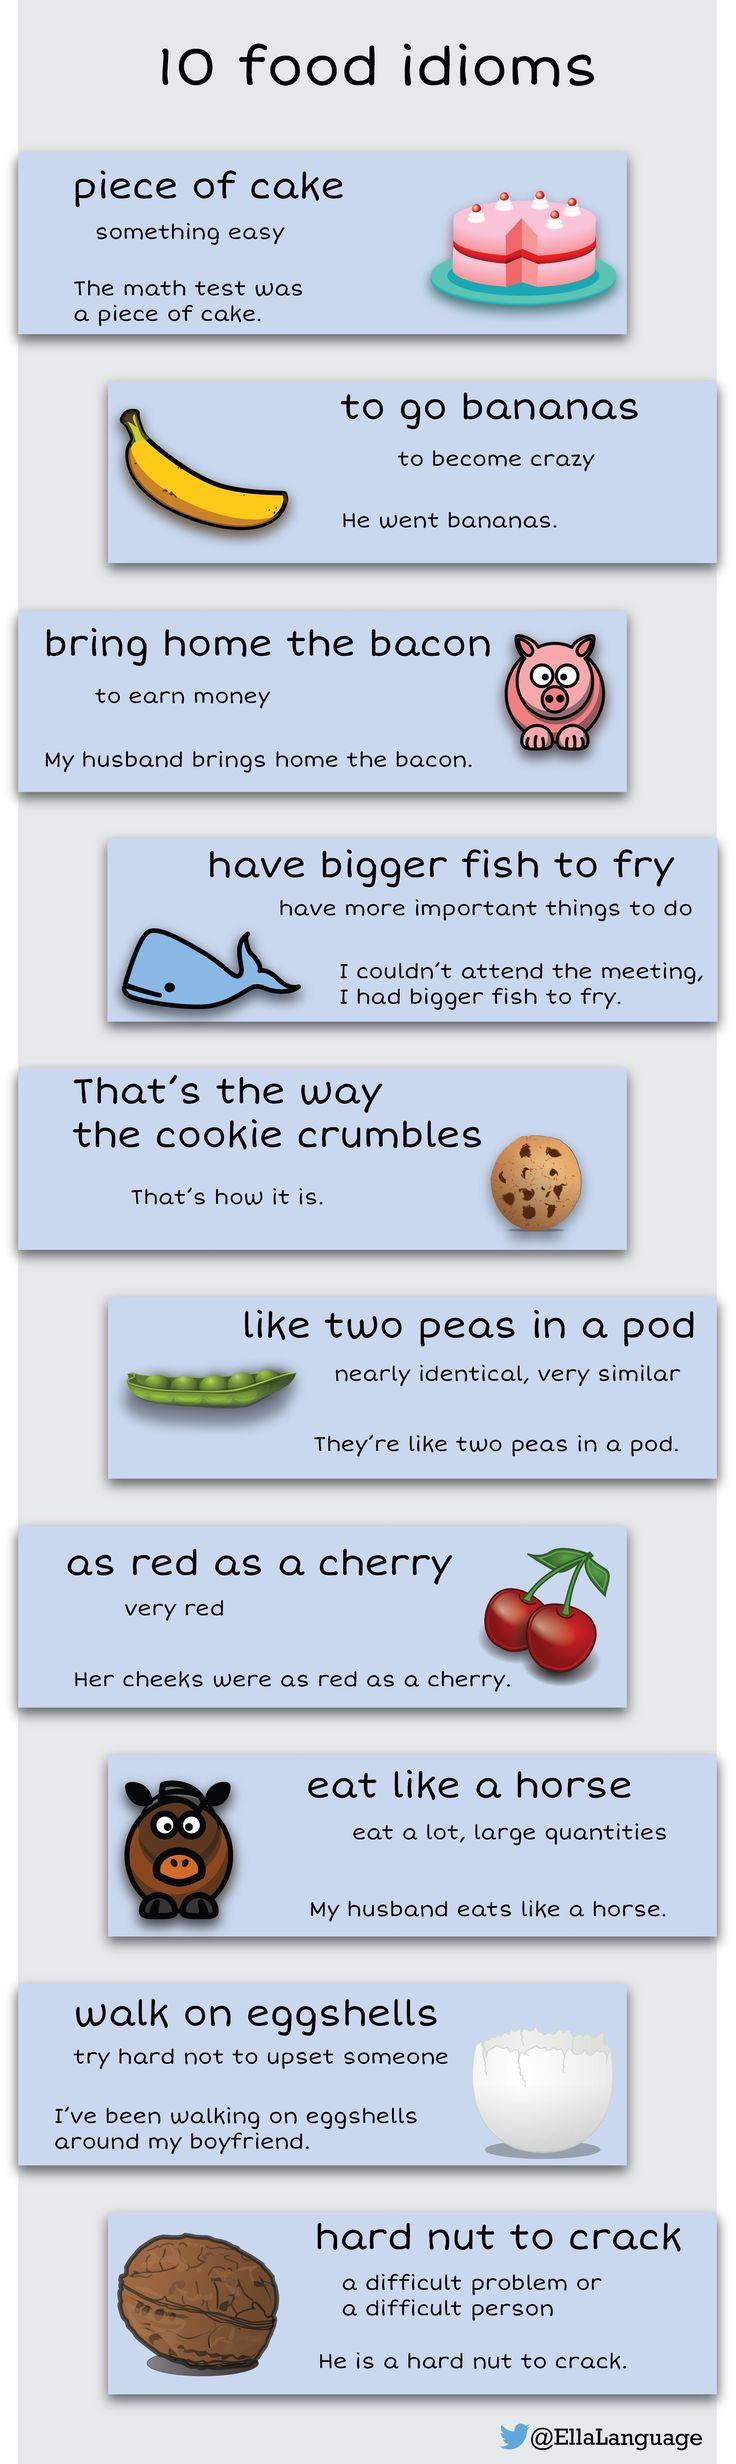 10 food idioms #ESL #idioms